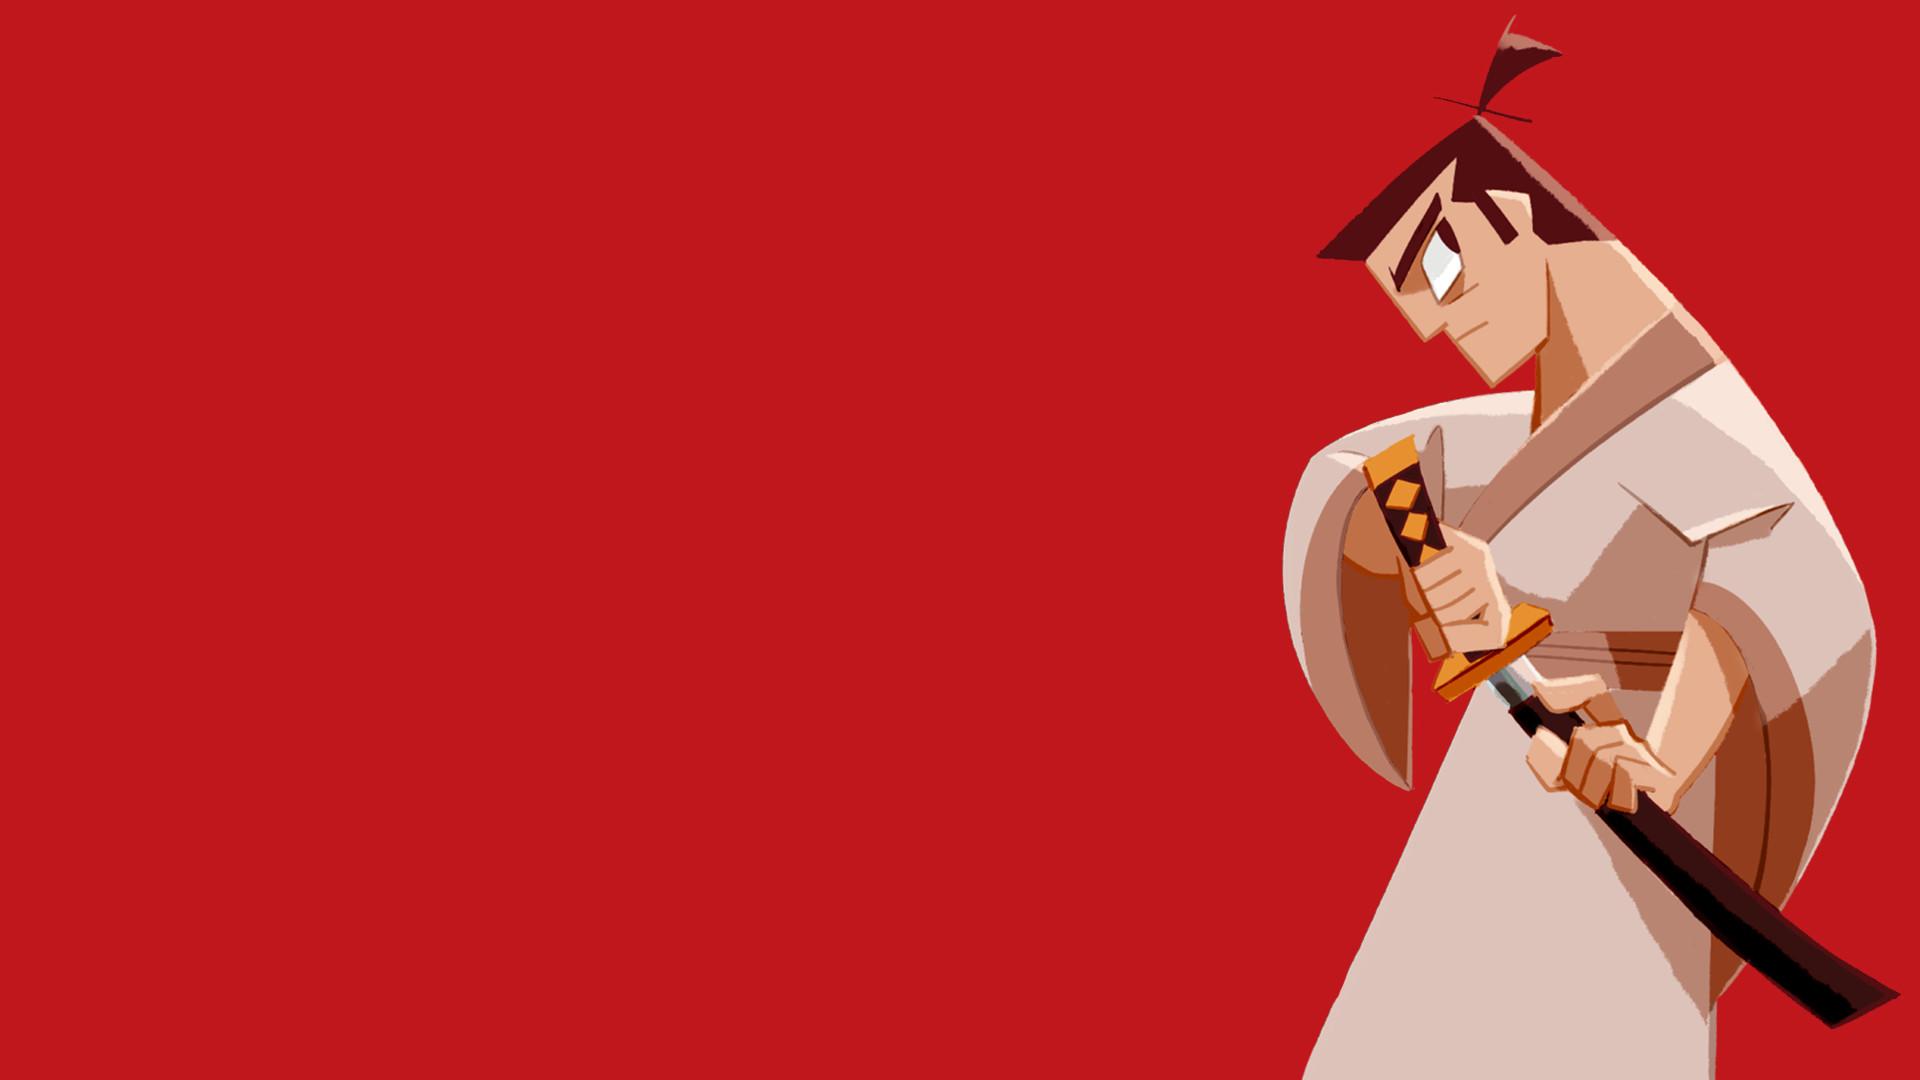 General Samurai Jack simple background samurai katana